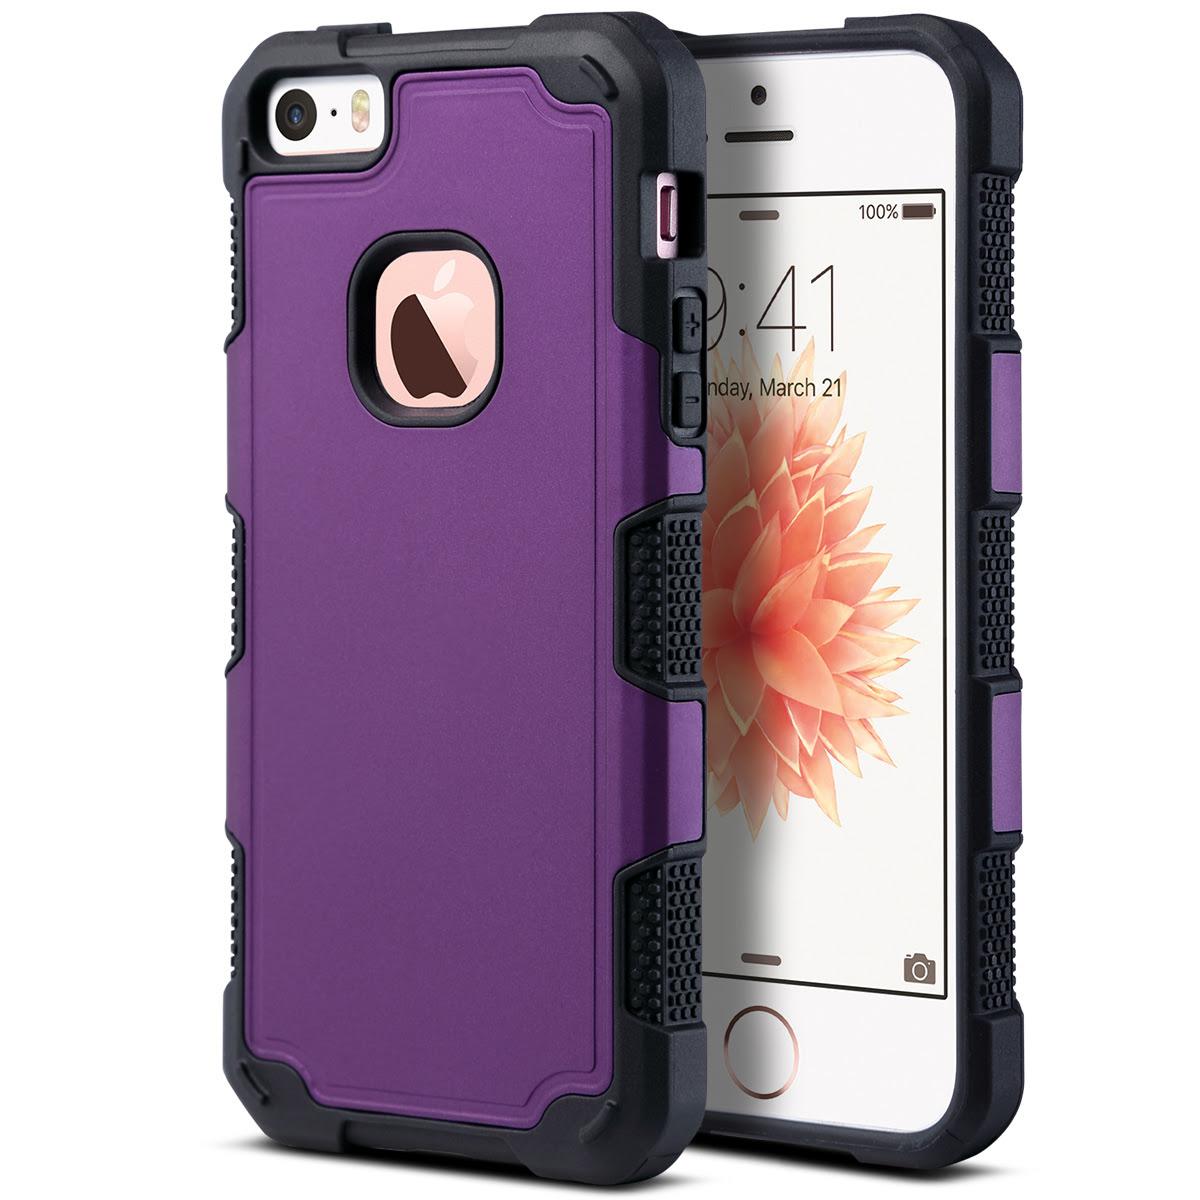 For iPhone 5 5S SE Hybrid Rugged Shockproof Hard ...